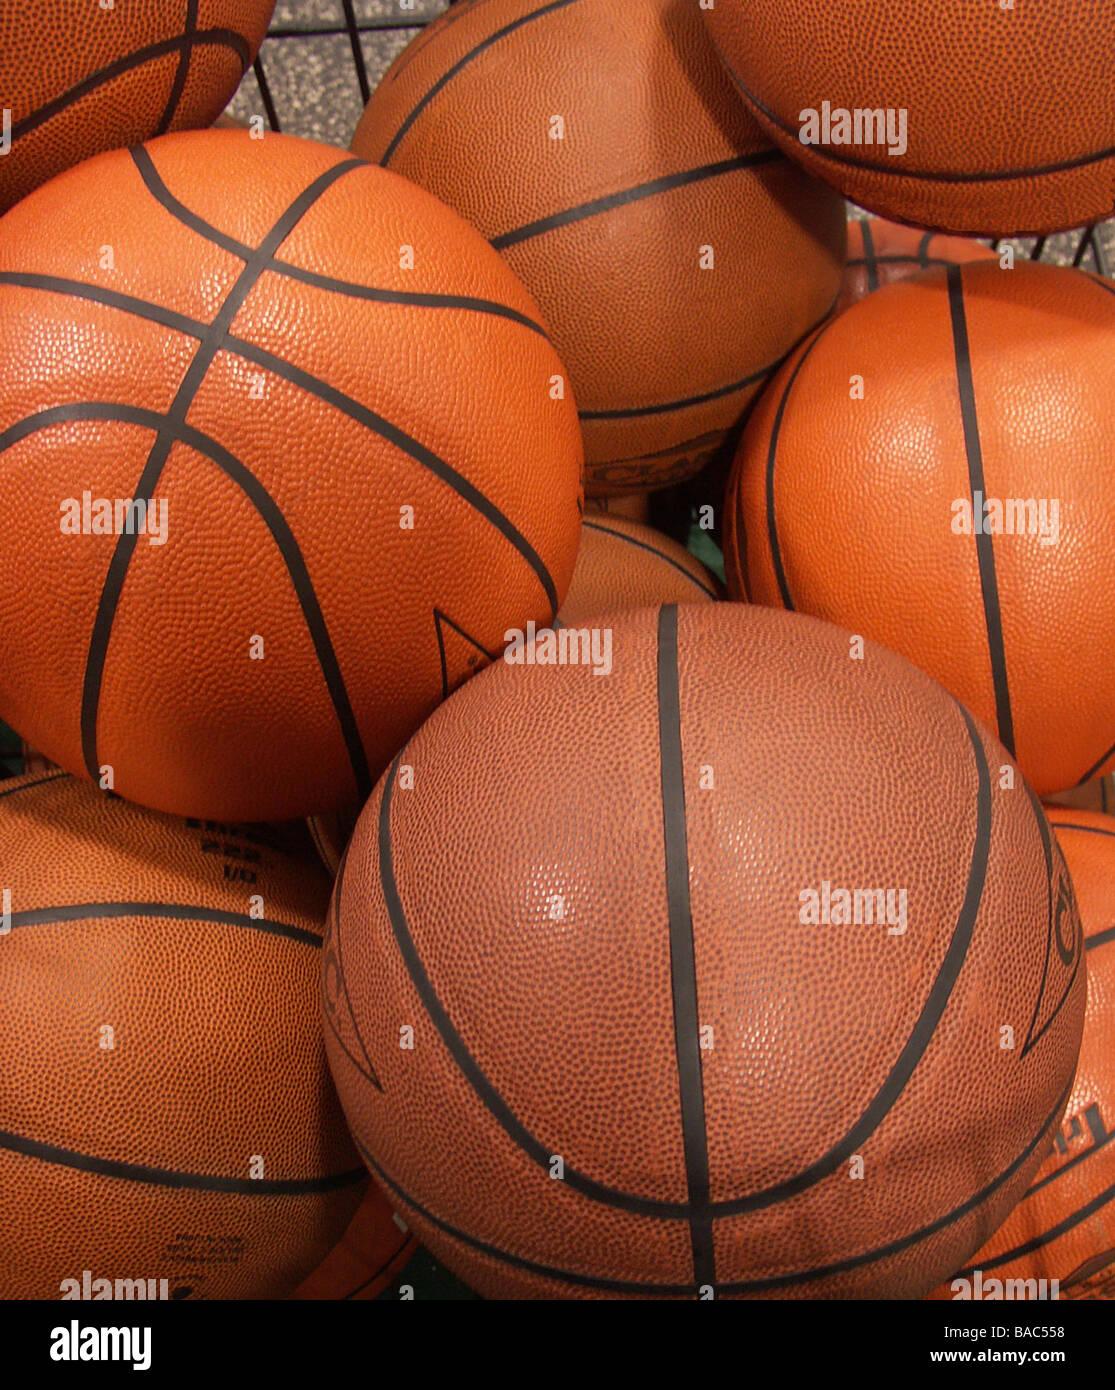 sporting goods - Stock Image